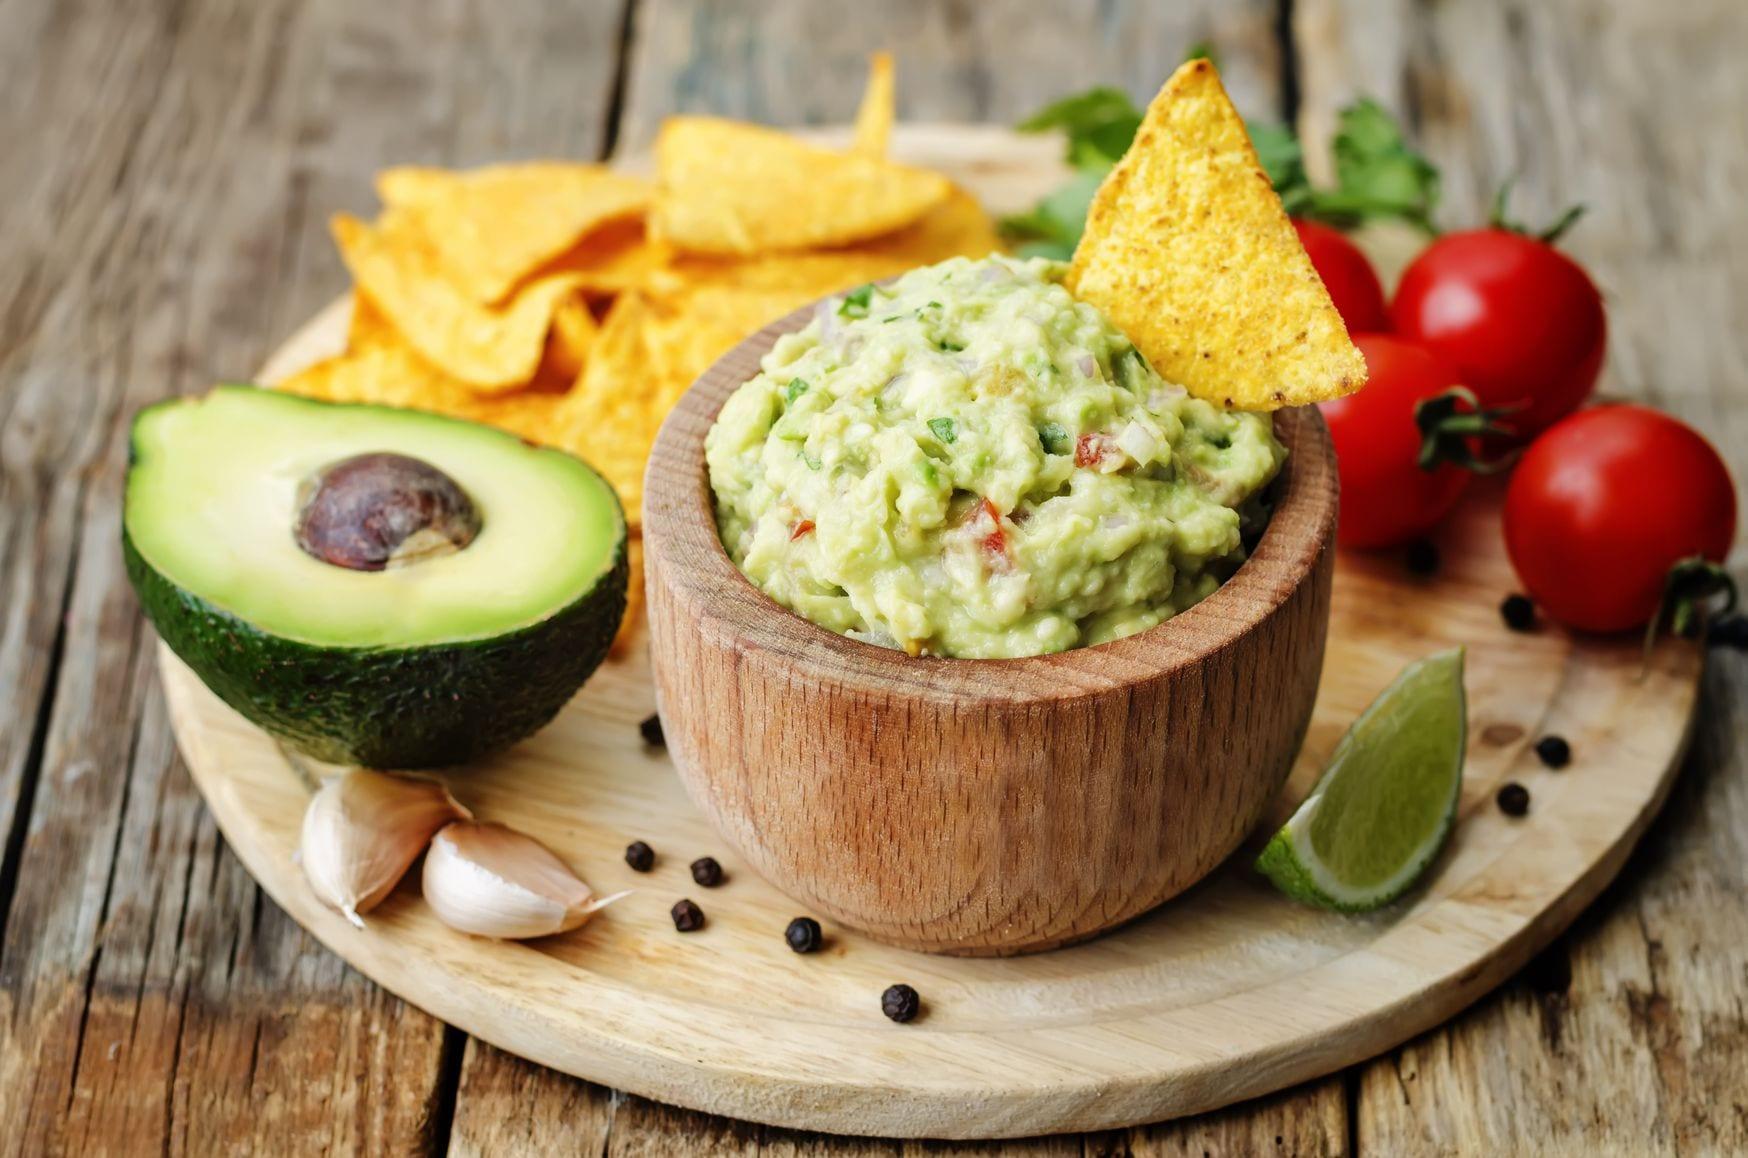 Guacamole Ein Leckerer Dip Mit Avocado Und Tomate Freshmag